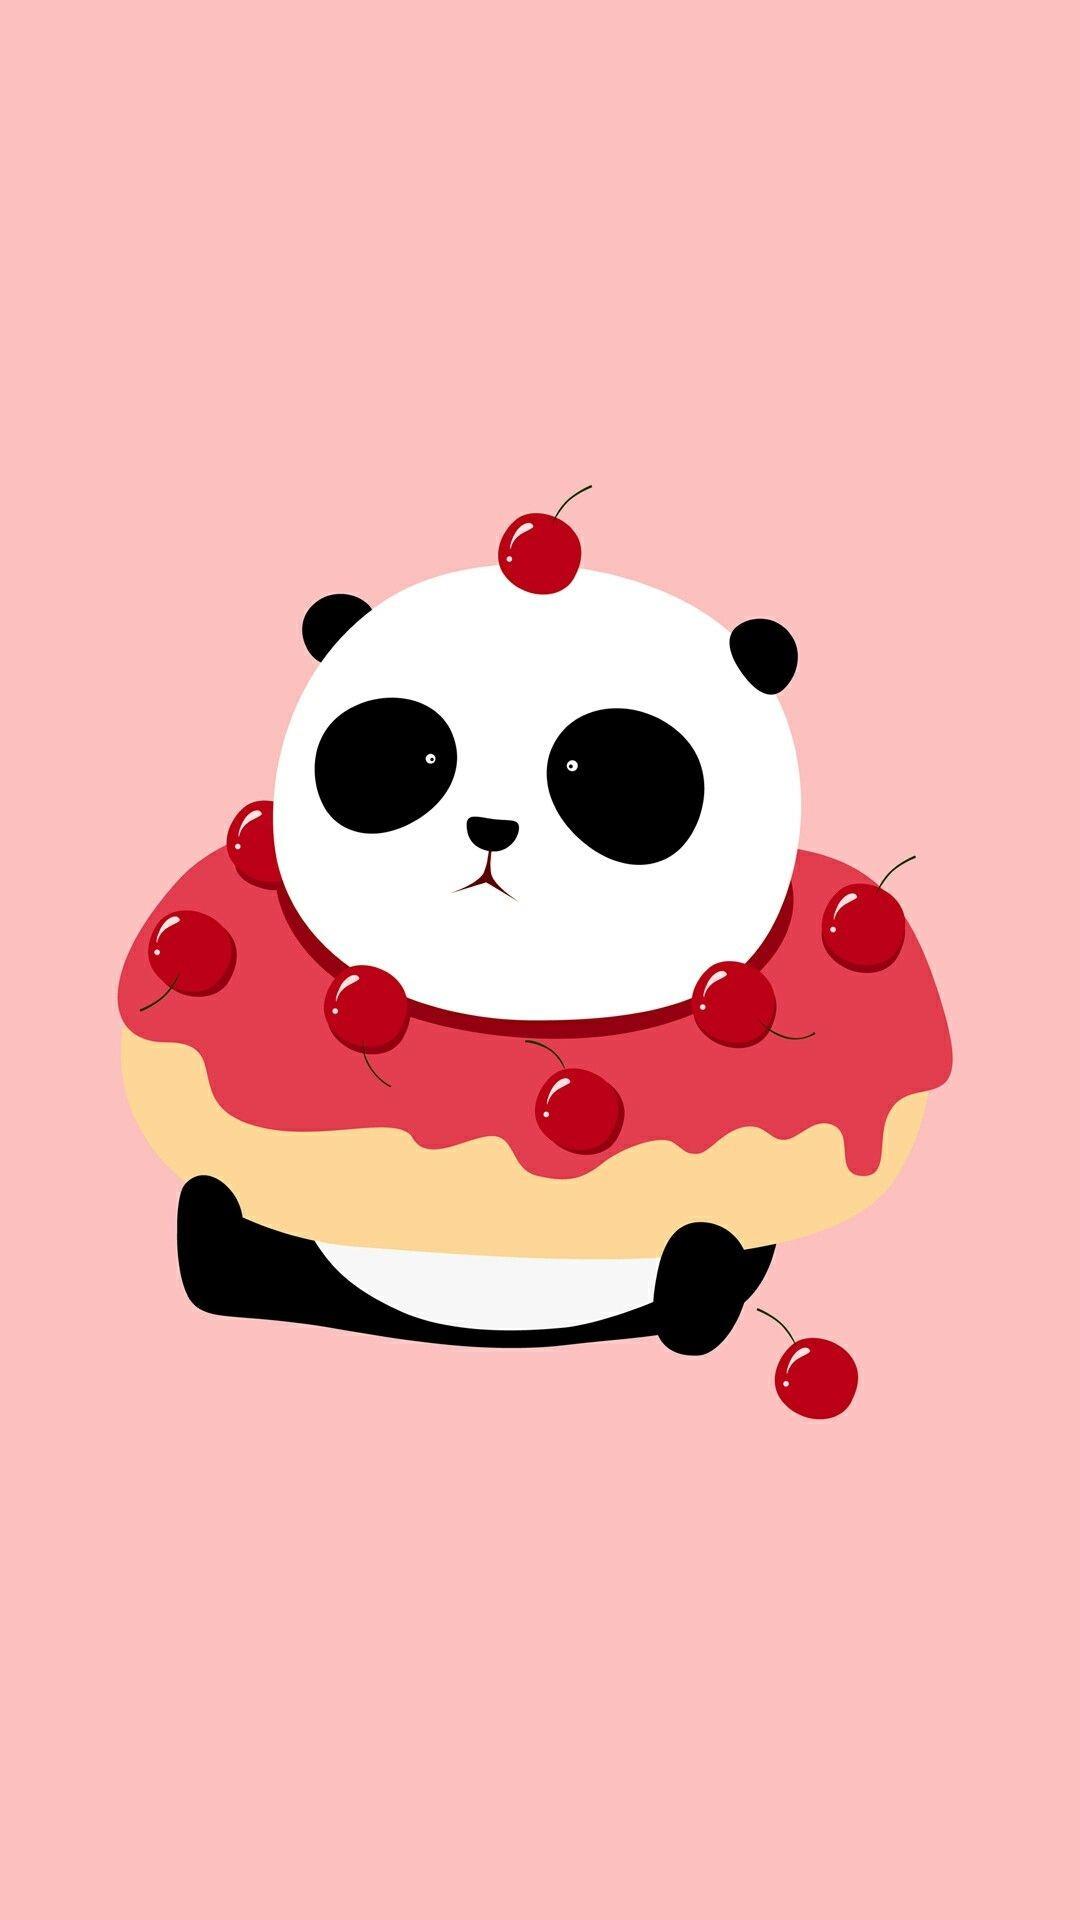 Tare Panda Wallpapers Posted By Samantha Walker